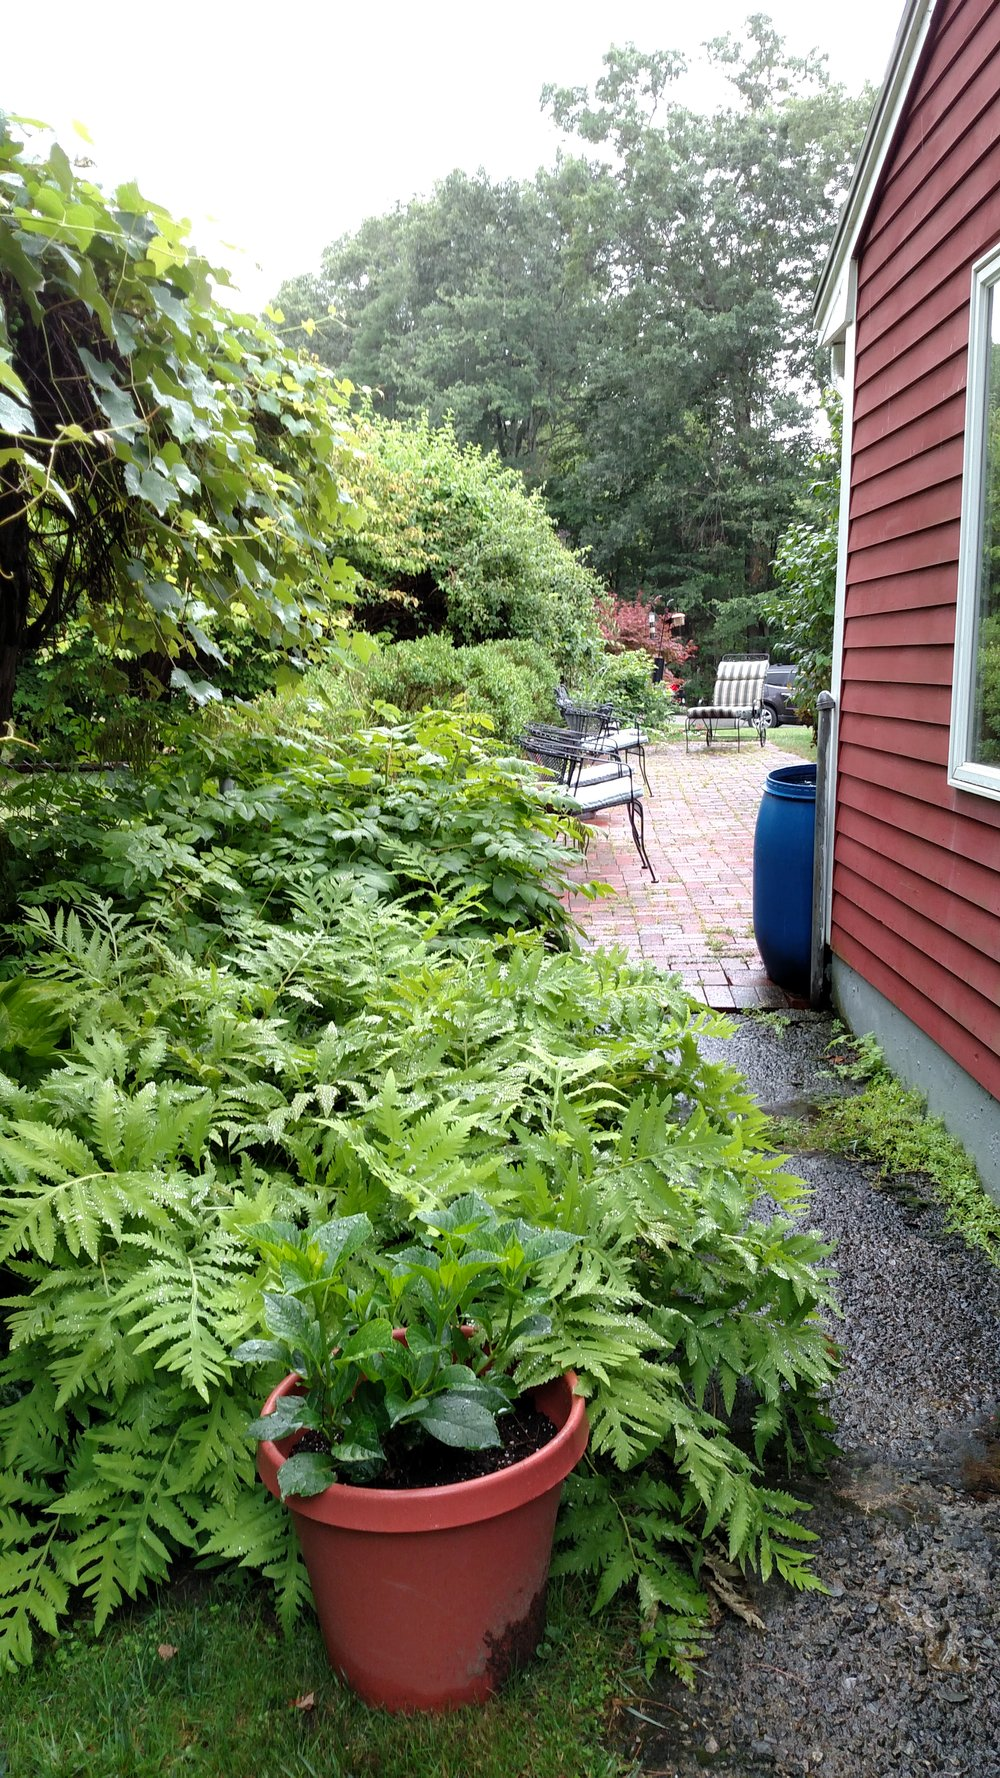 7-20-18 Shapiro Garden 13.jpg